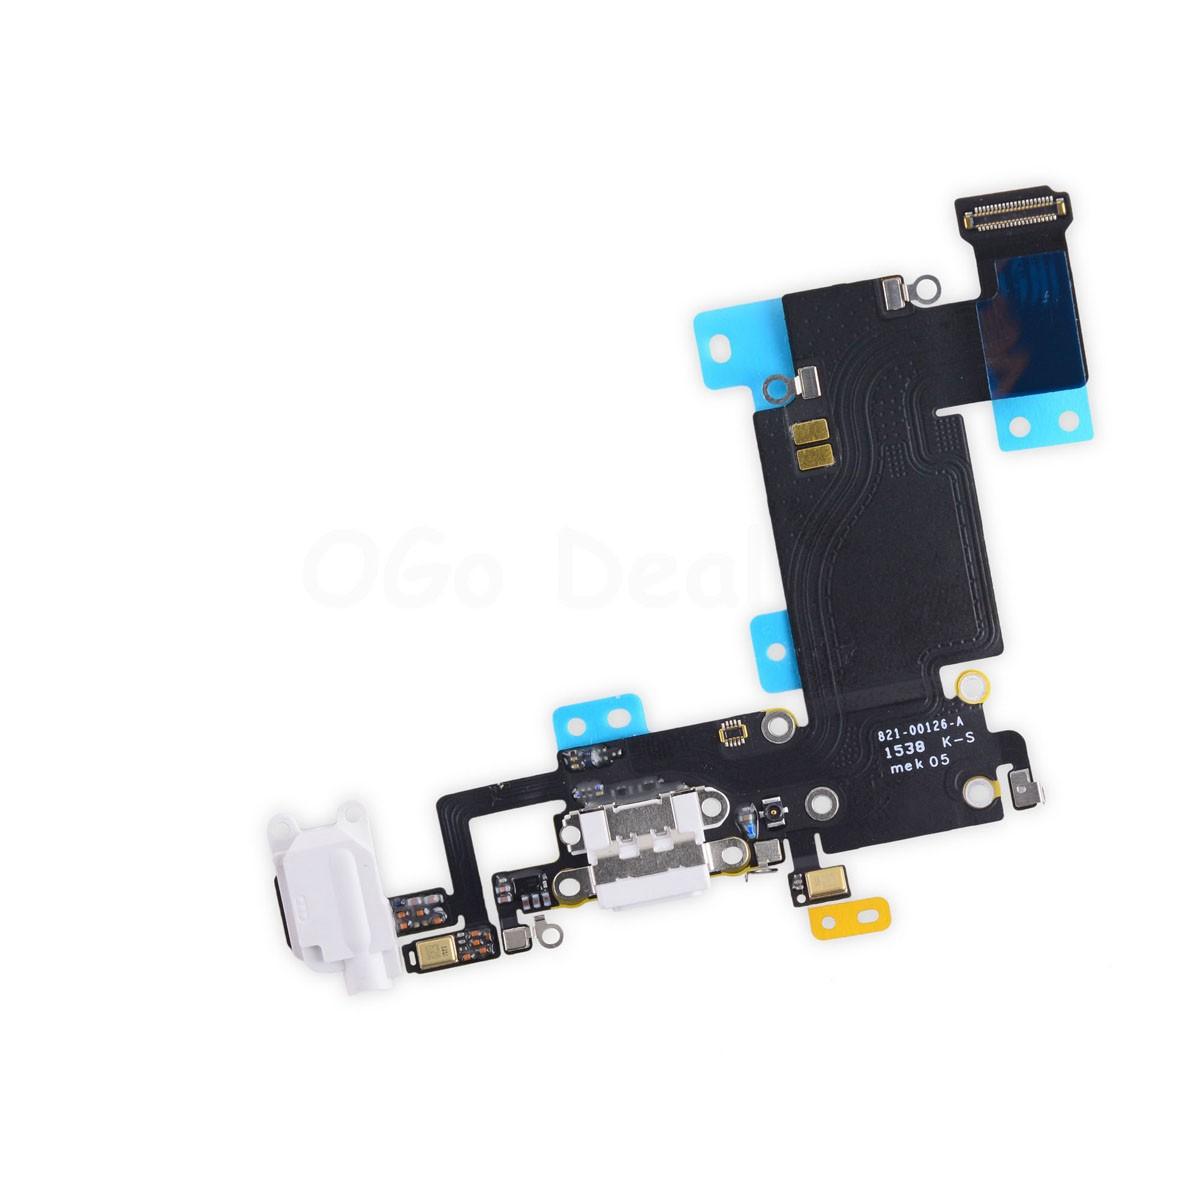 Iphone S Headphone Jack Replacement